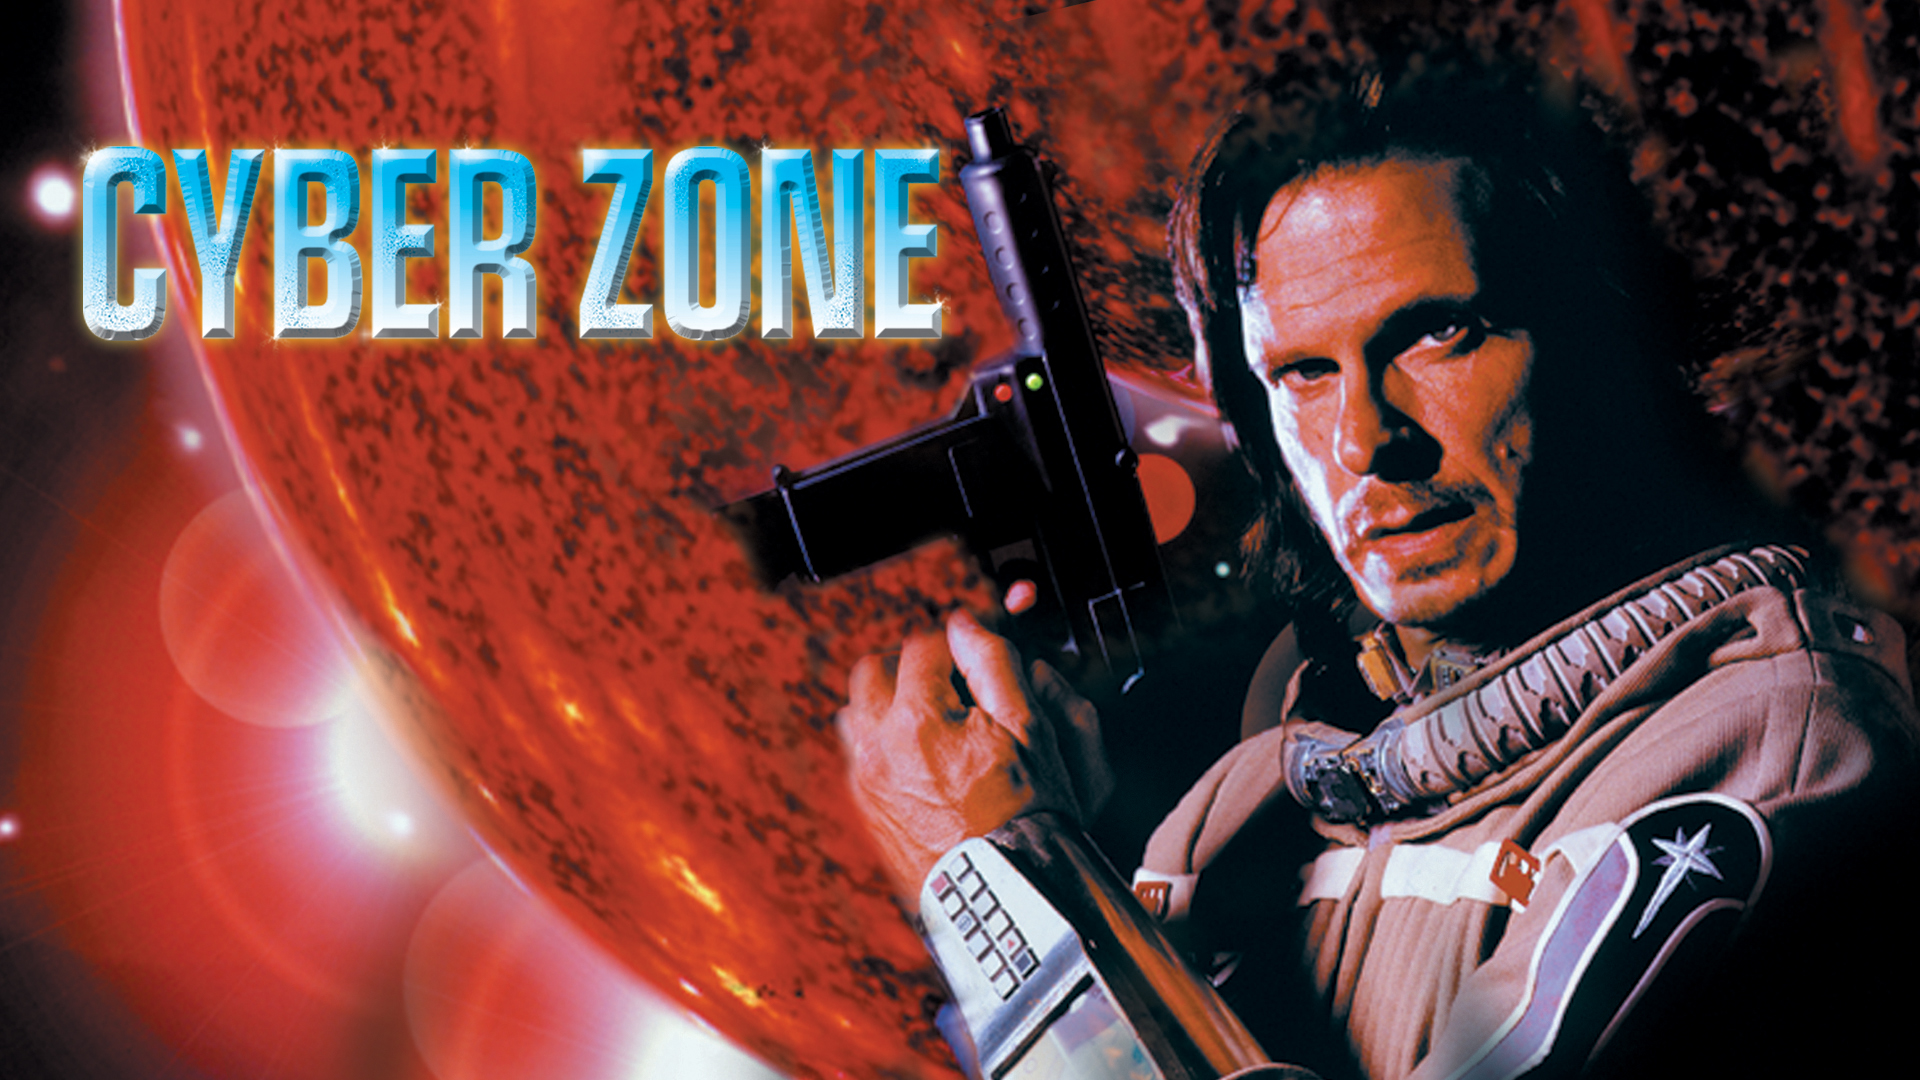 Cyberzone